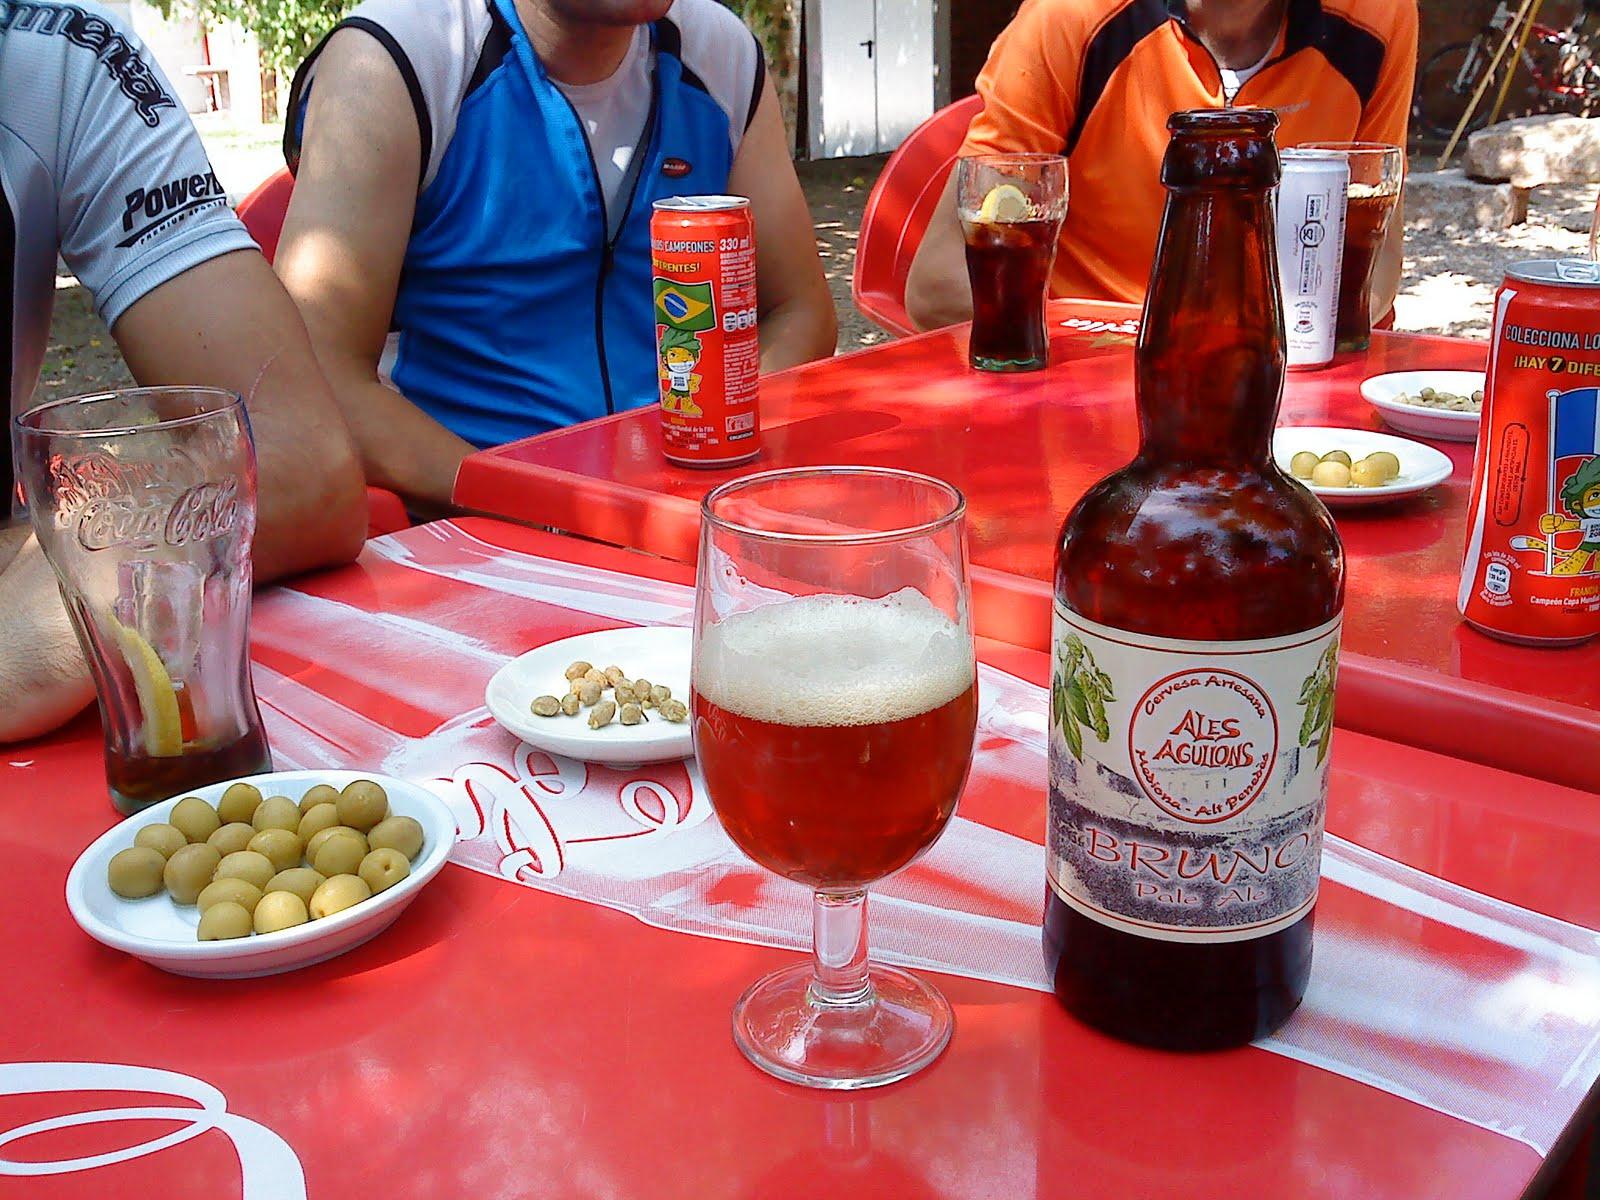 Mountain bike a c prat salida 3 julio sant sadurni d 39 anoia - Tiempo en sant sadurni d anoia ...